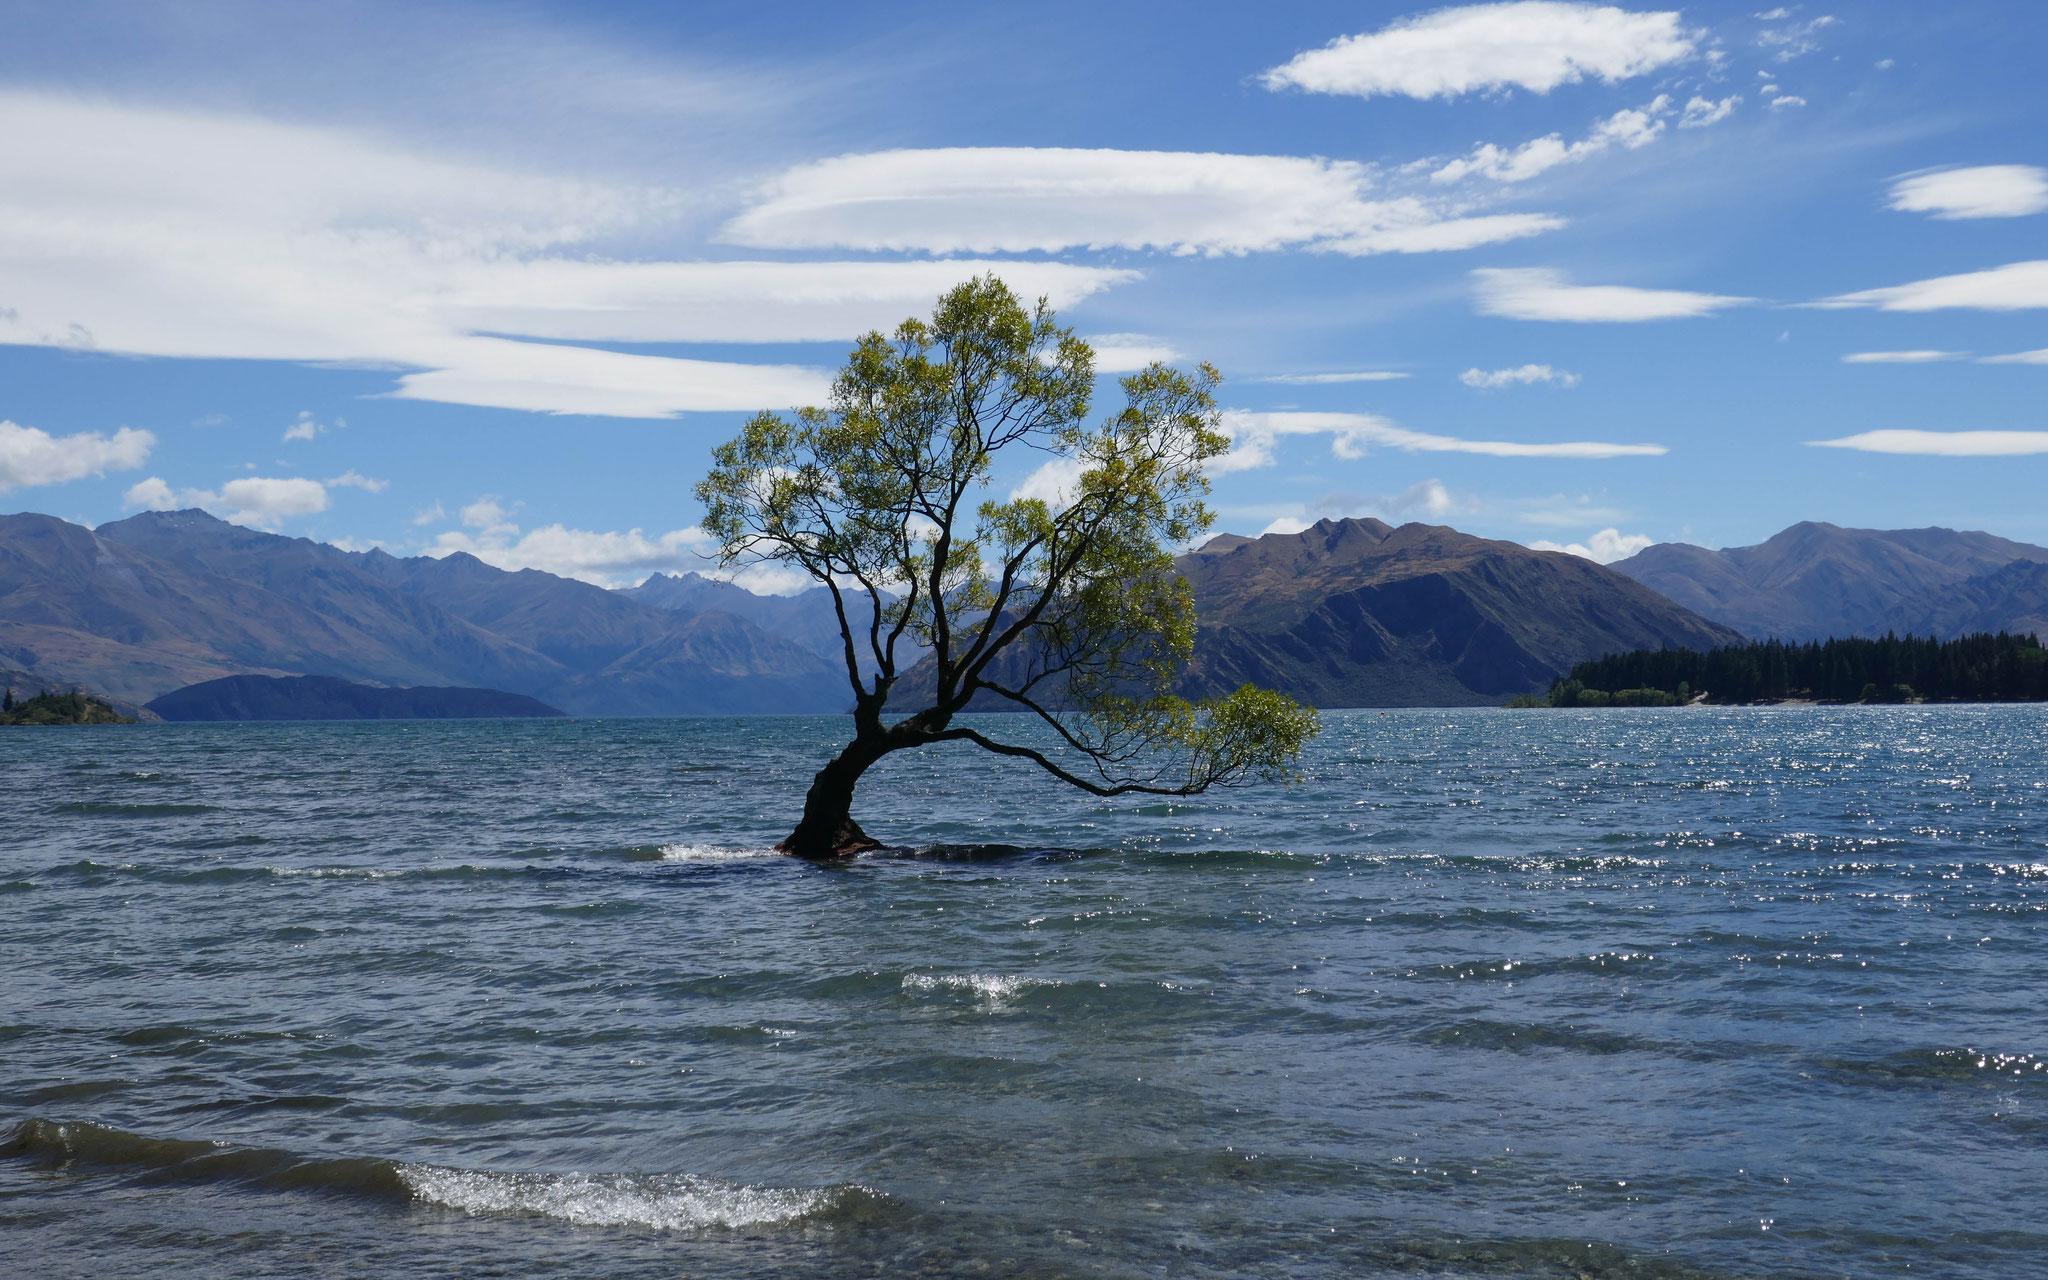 Fototbaum im Lake Wanaka